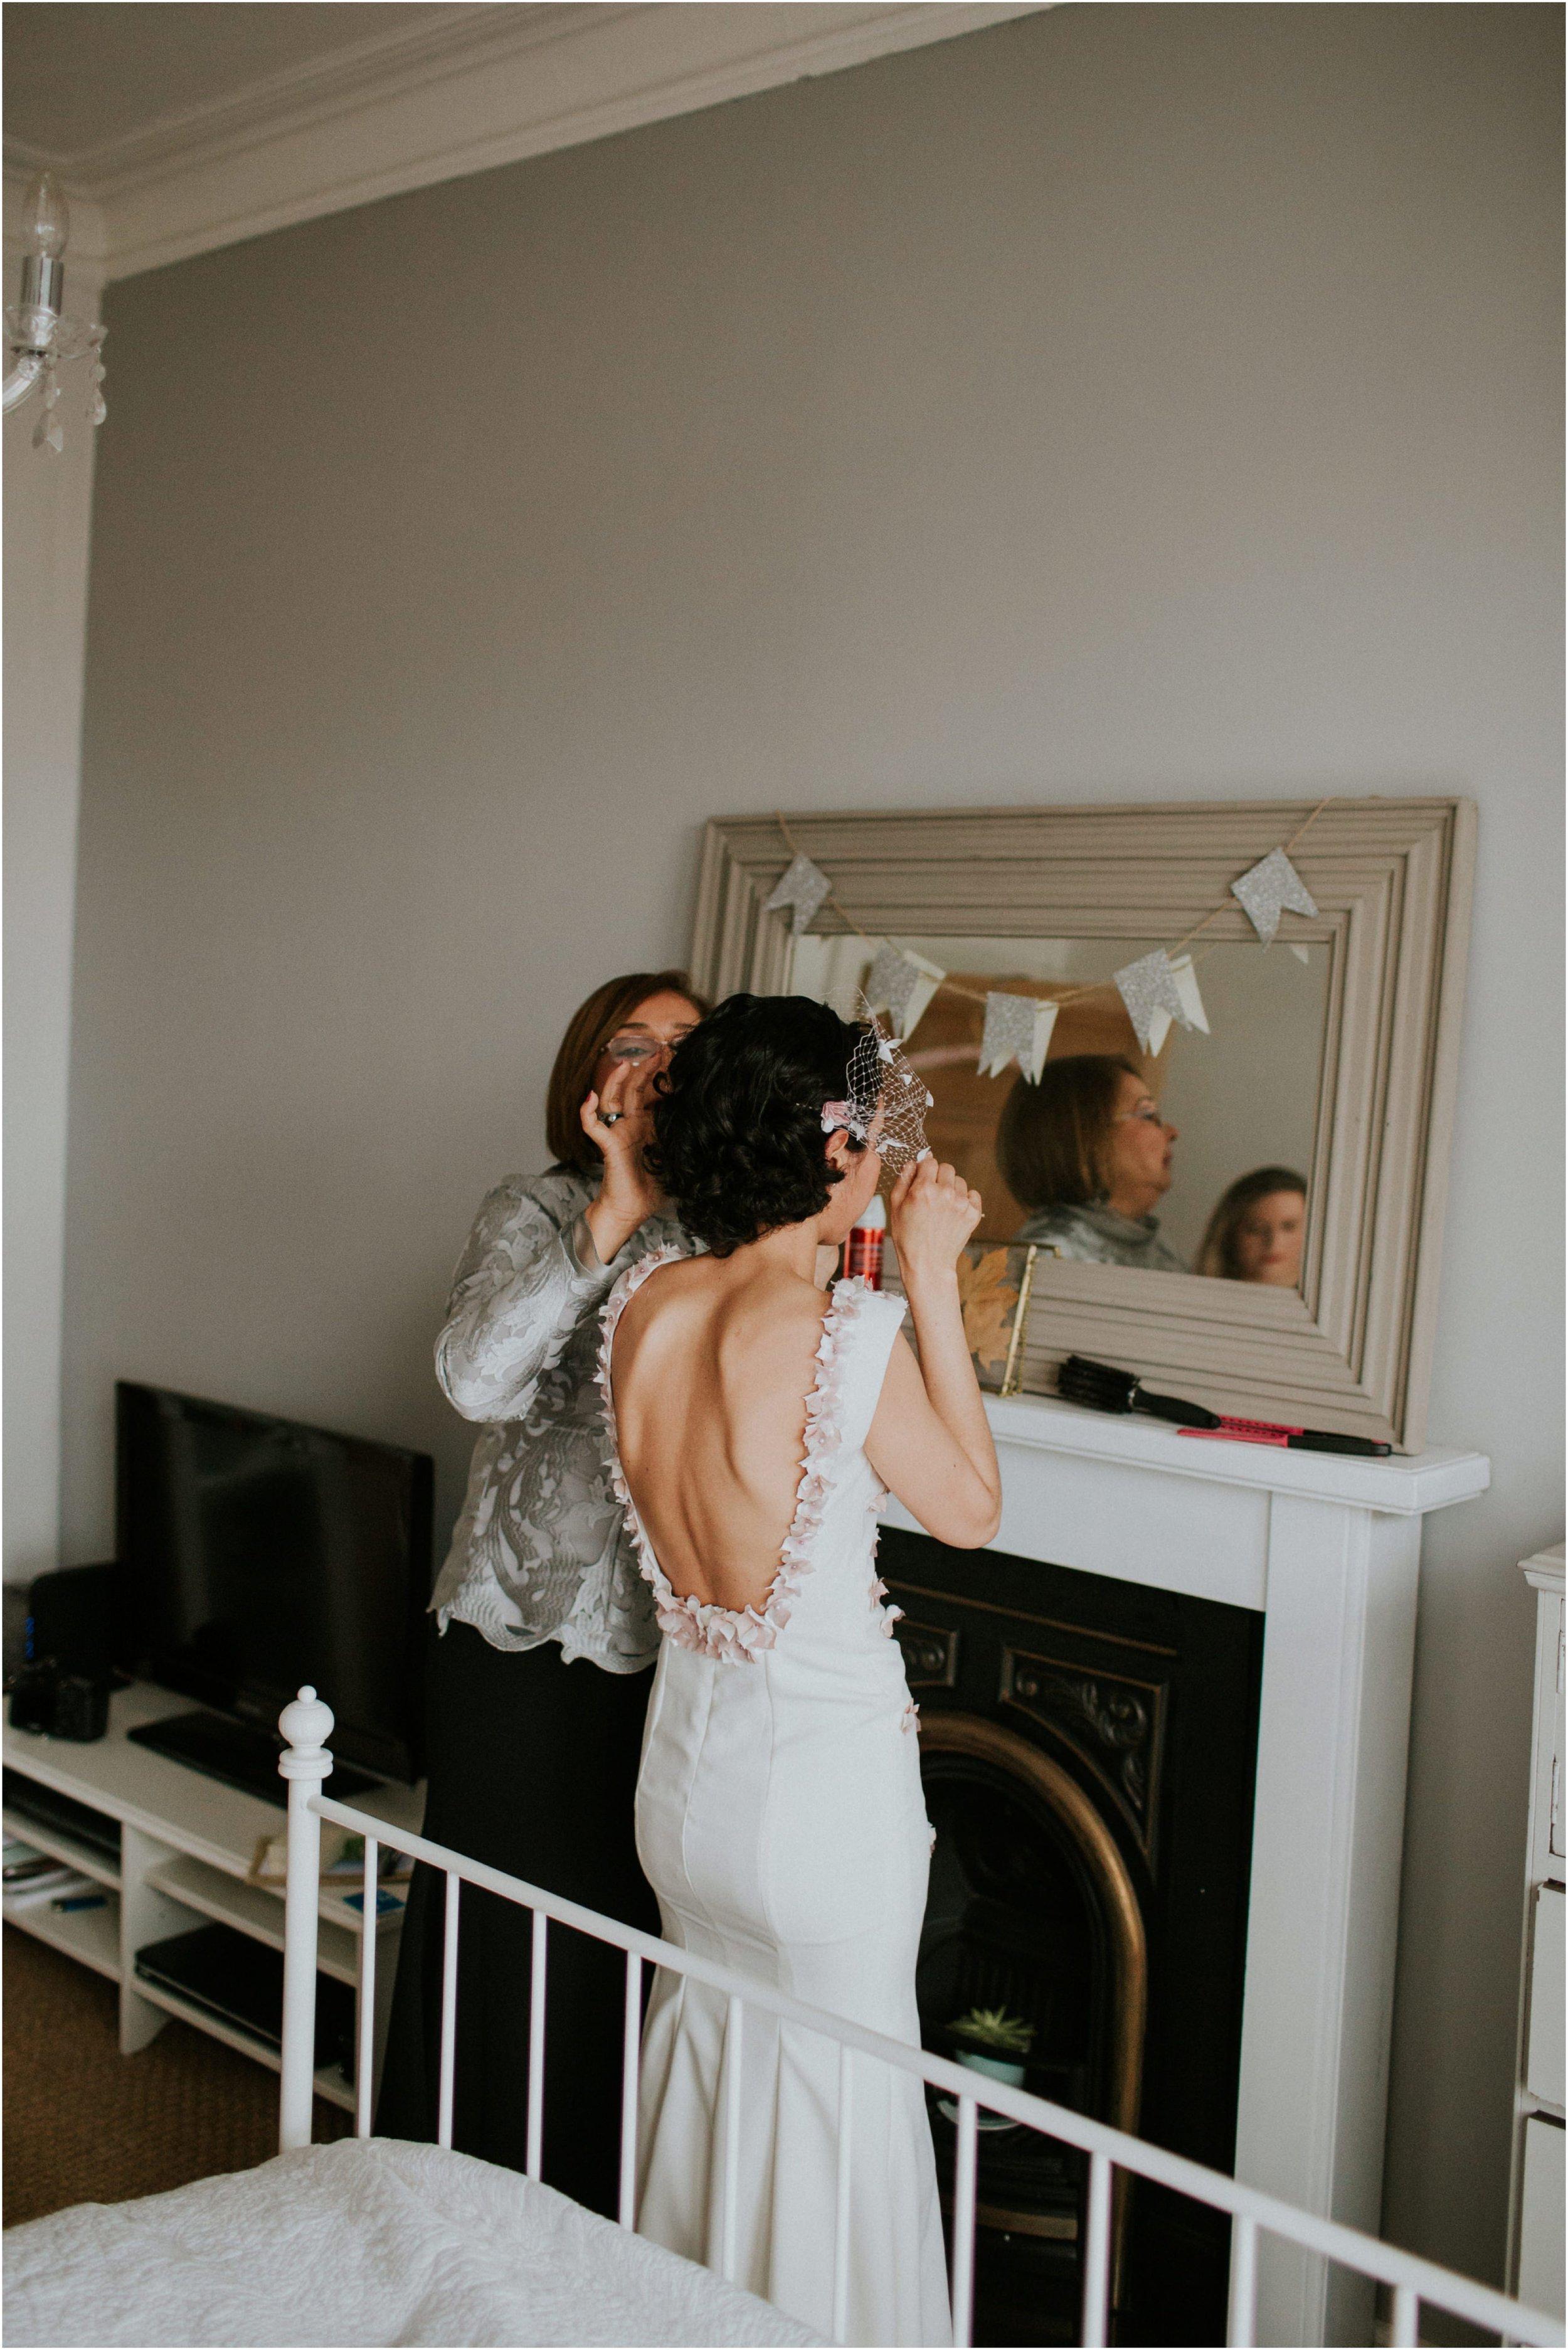 Photography 78 - Glasgow Wedding Photographer - Mike & Karol - Ubiquitous Chip Ashton Lane_0015.jpg